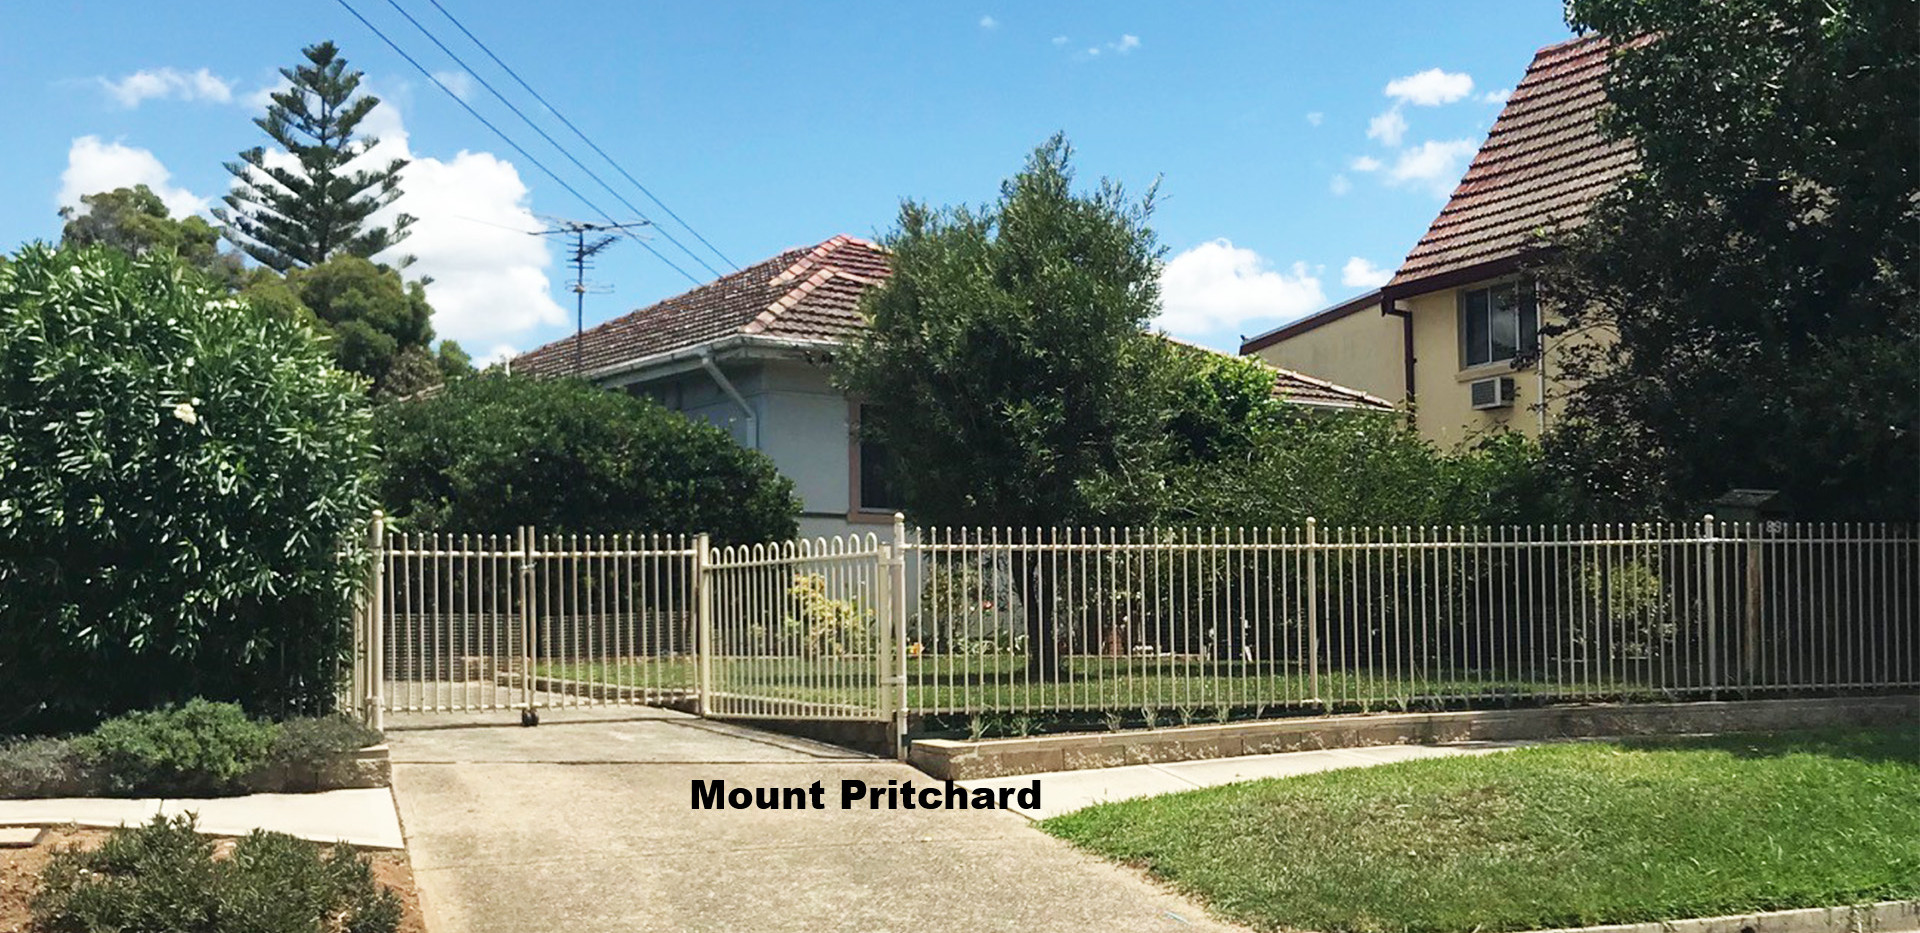 Mount Pritchard